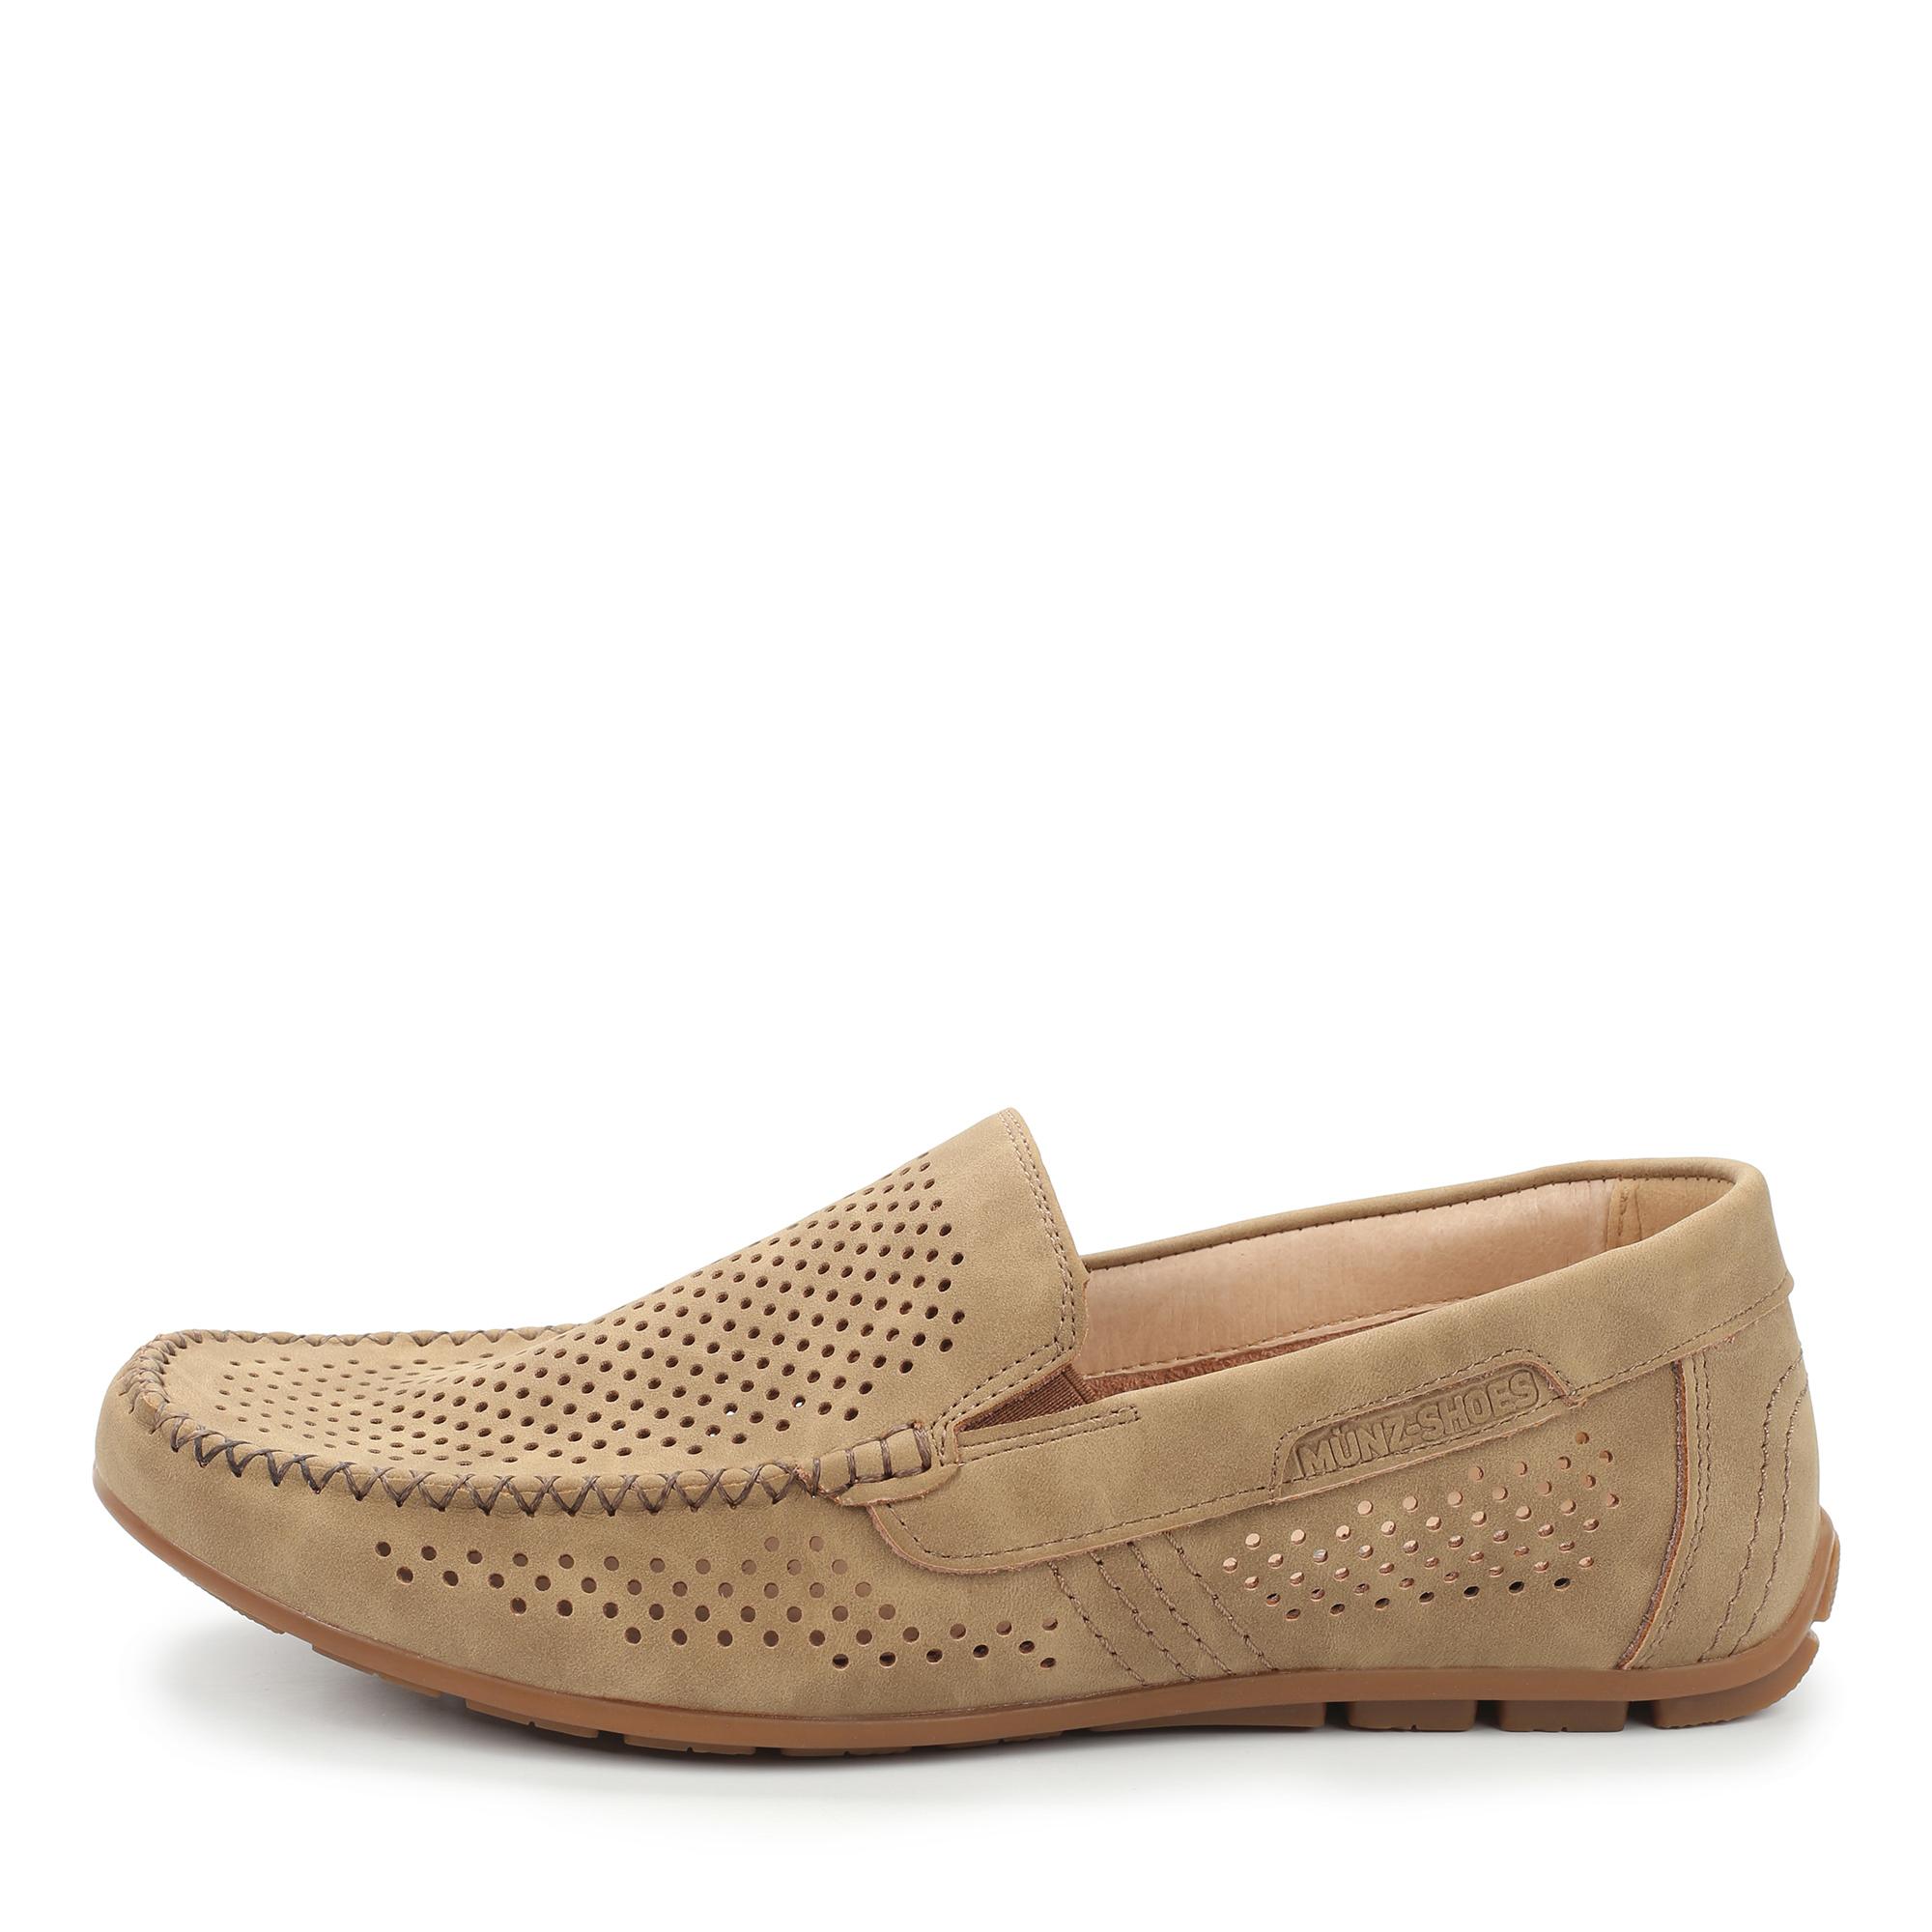 Мокасины MUNZ Shoes 187-191A-1608 фото